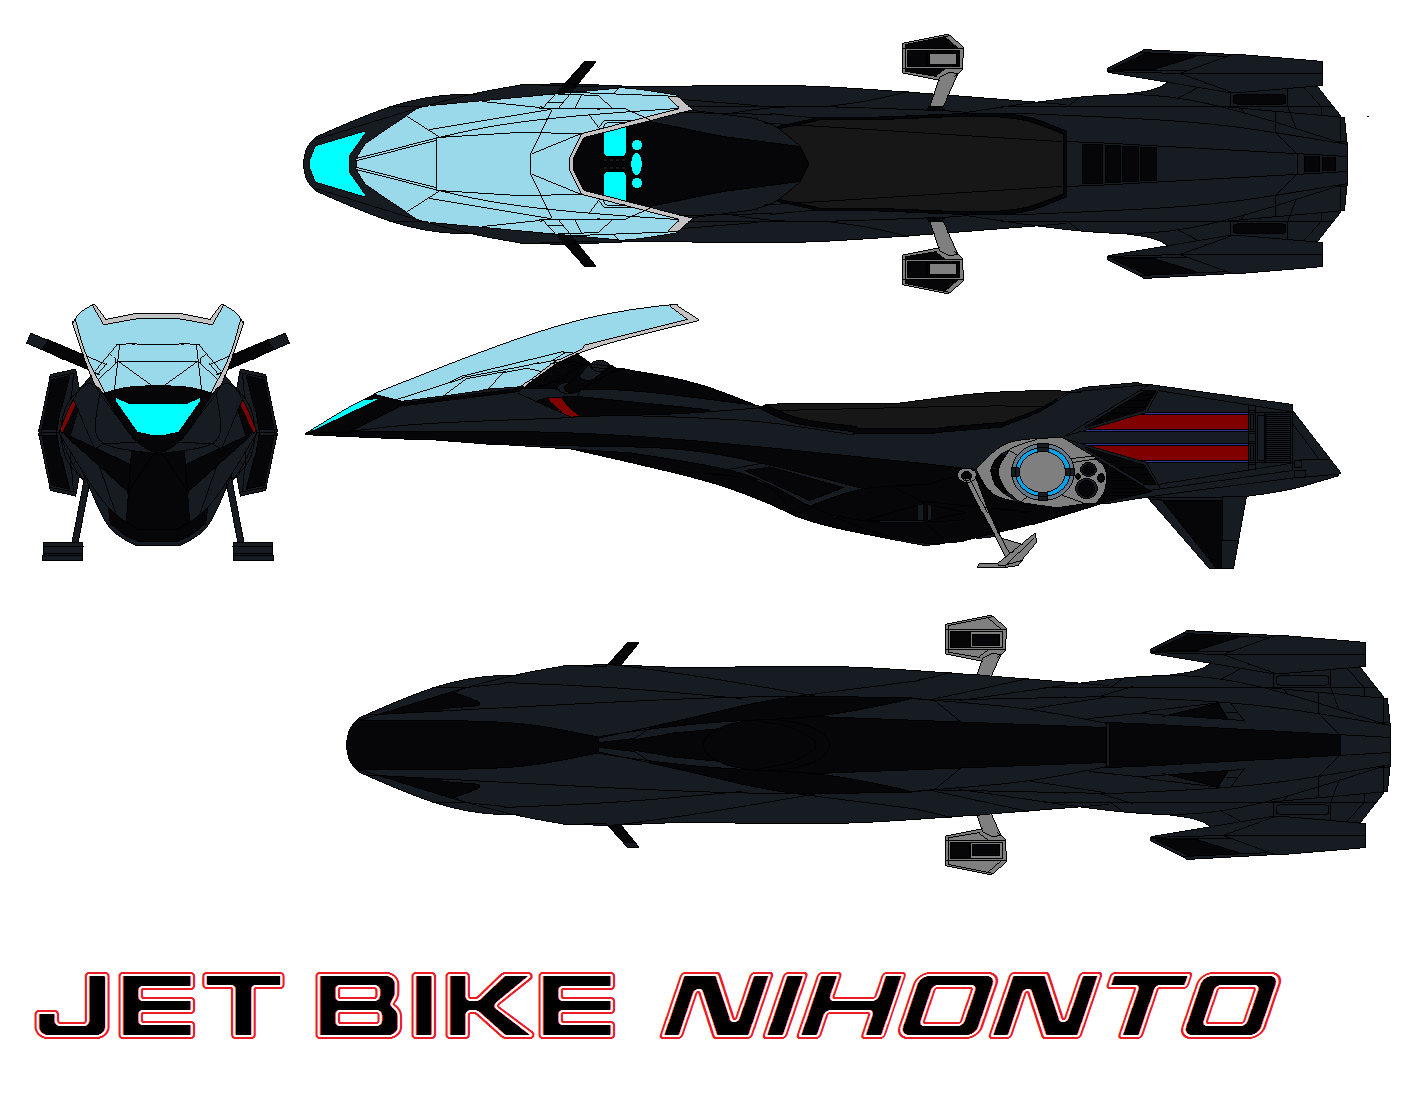 Jet Bike Nihonto by bagera3005